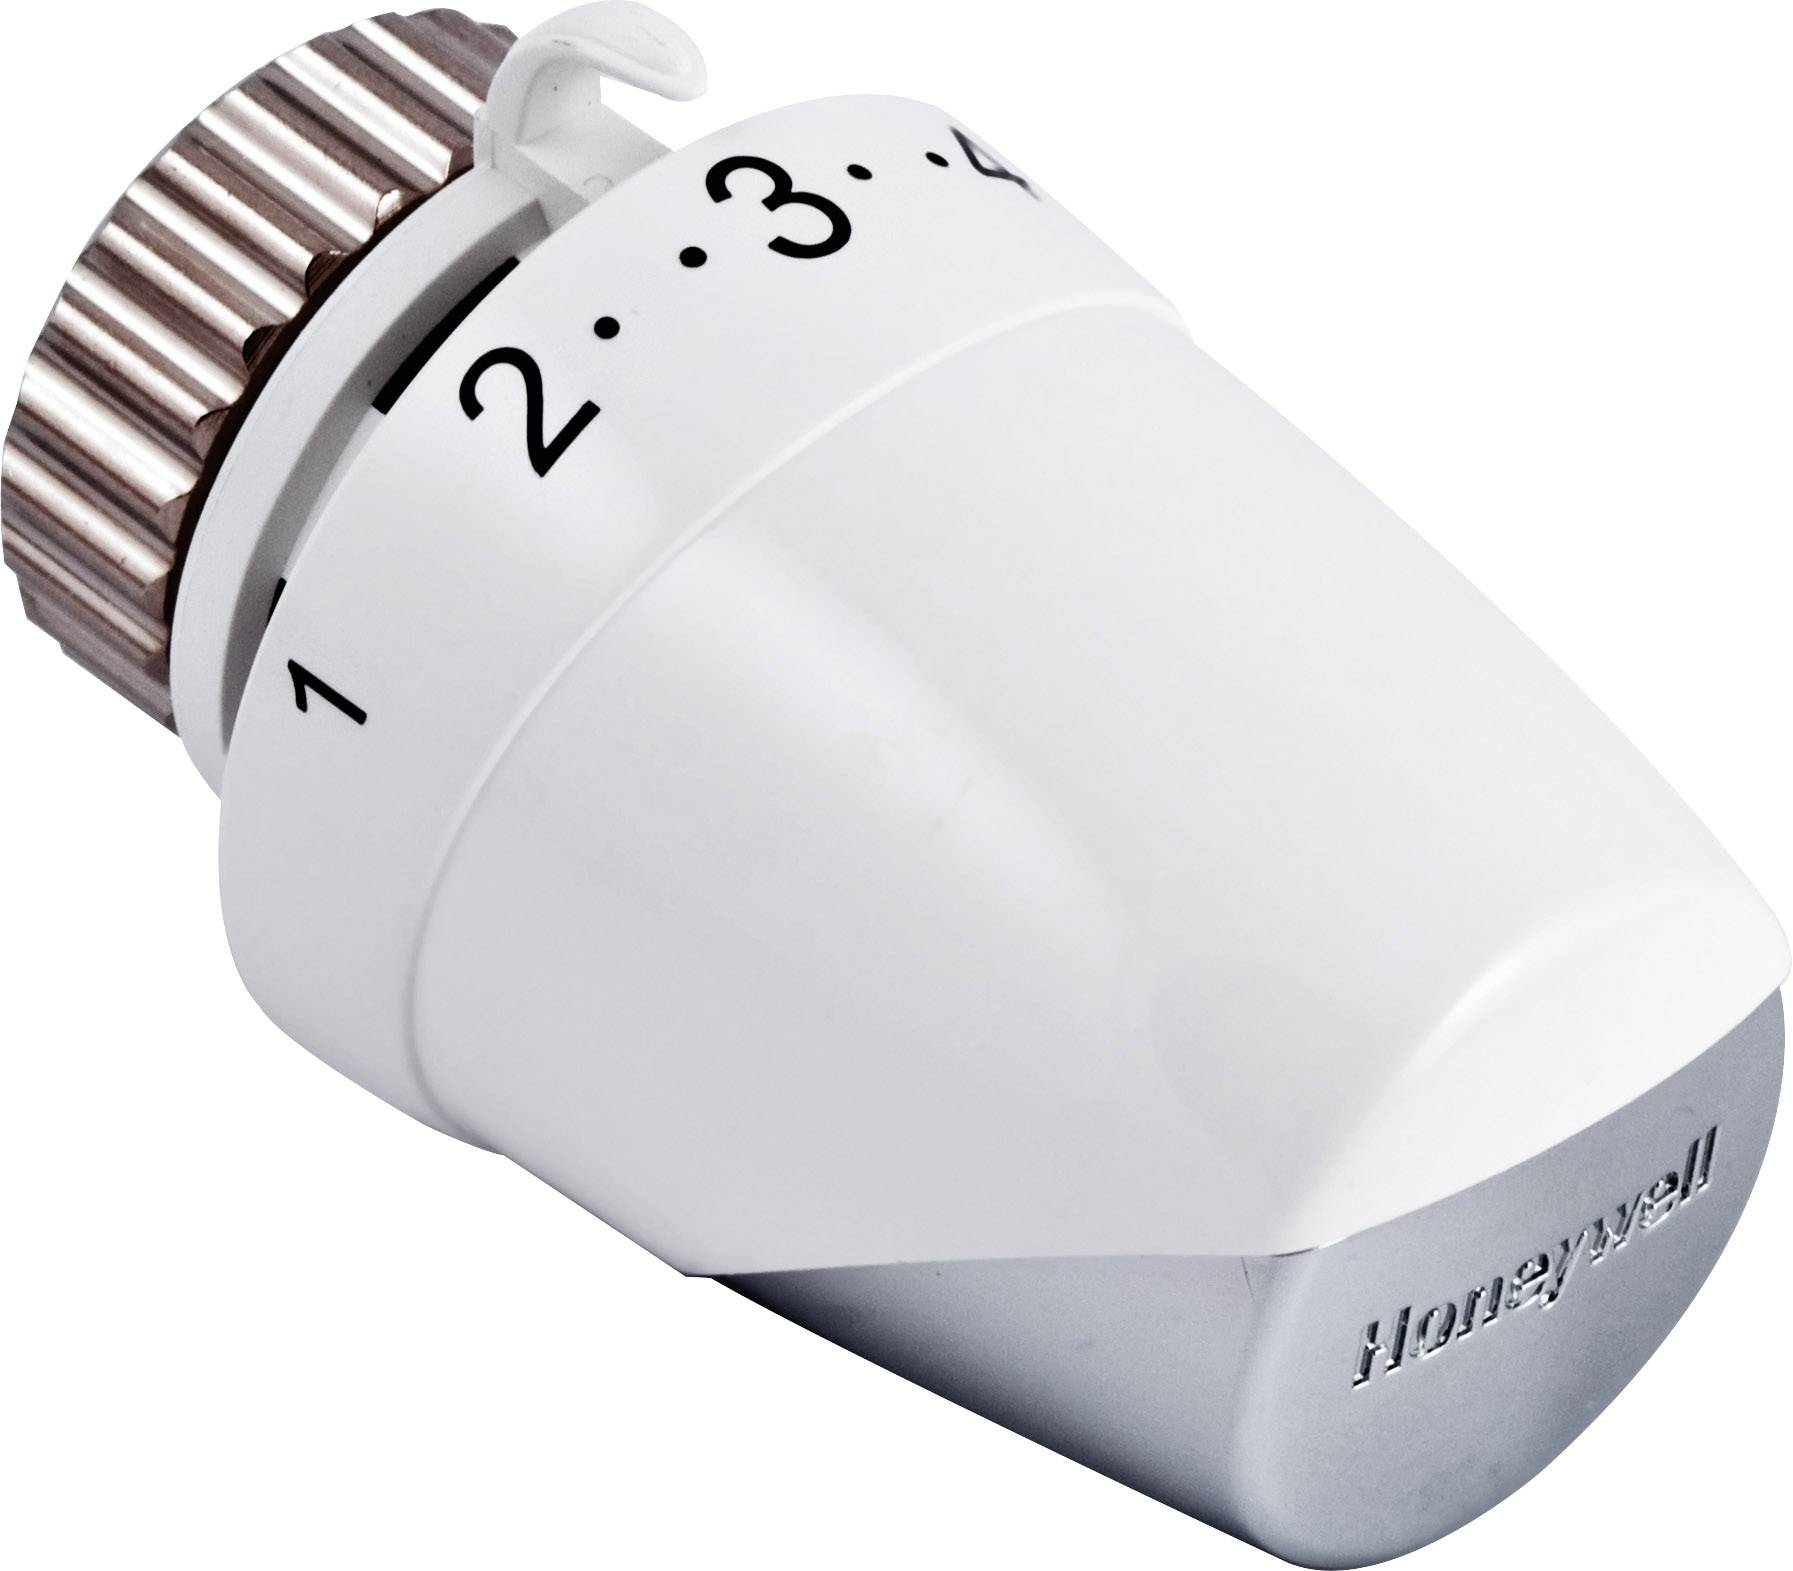 Radiátorová termostatická hlavica Honeywell Thera-4 Design T2021, 6 do 28 °C